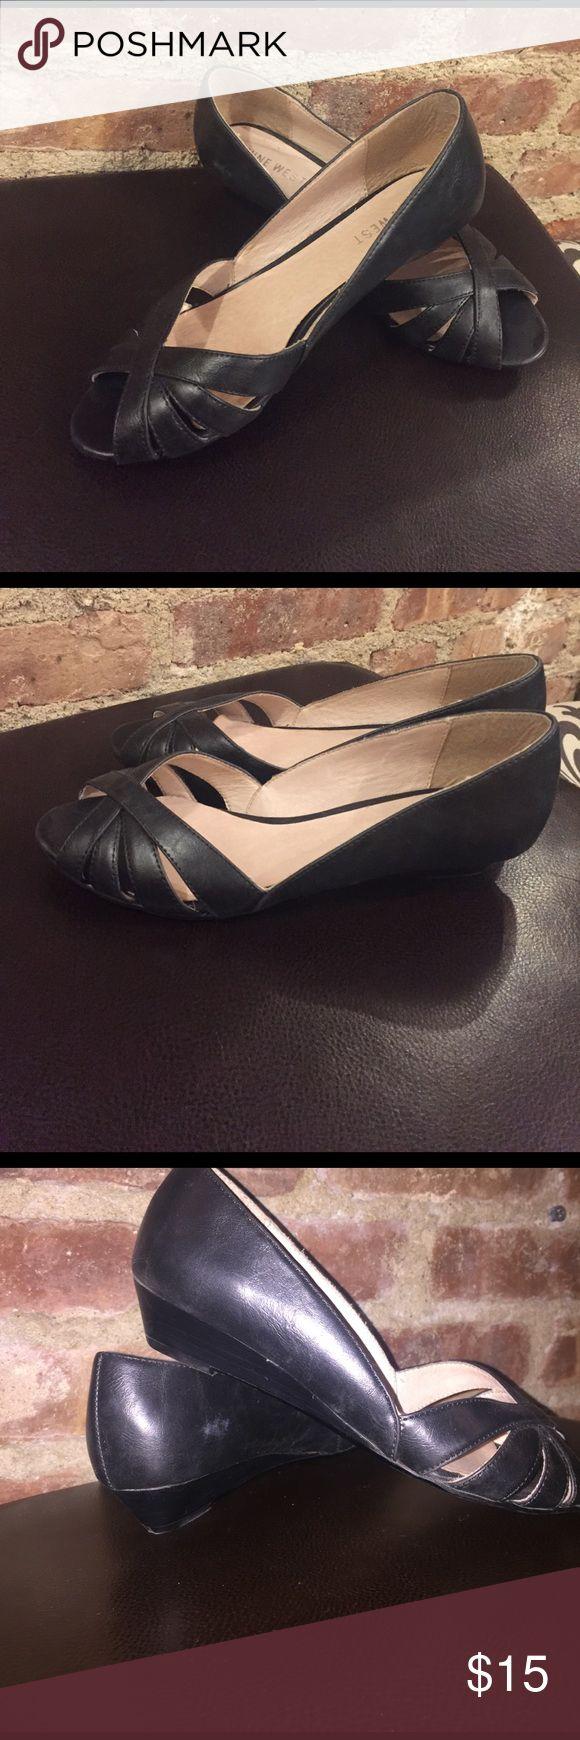 Black sandals littlewoods - 9 West Peep Toe Low Wedge Sandal